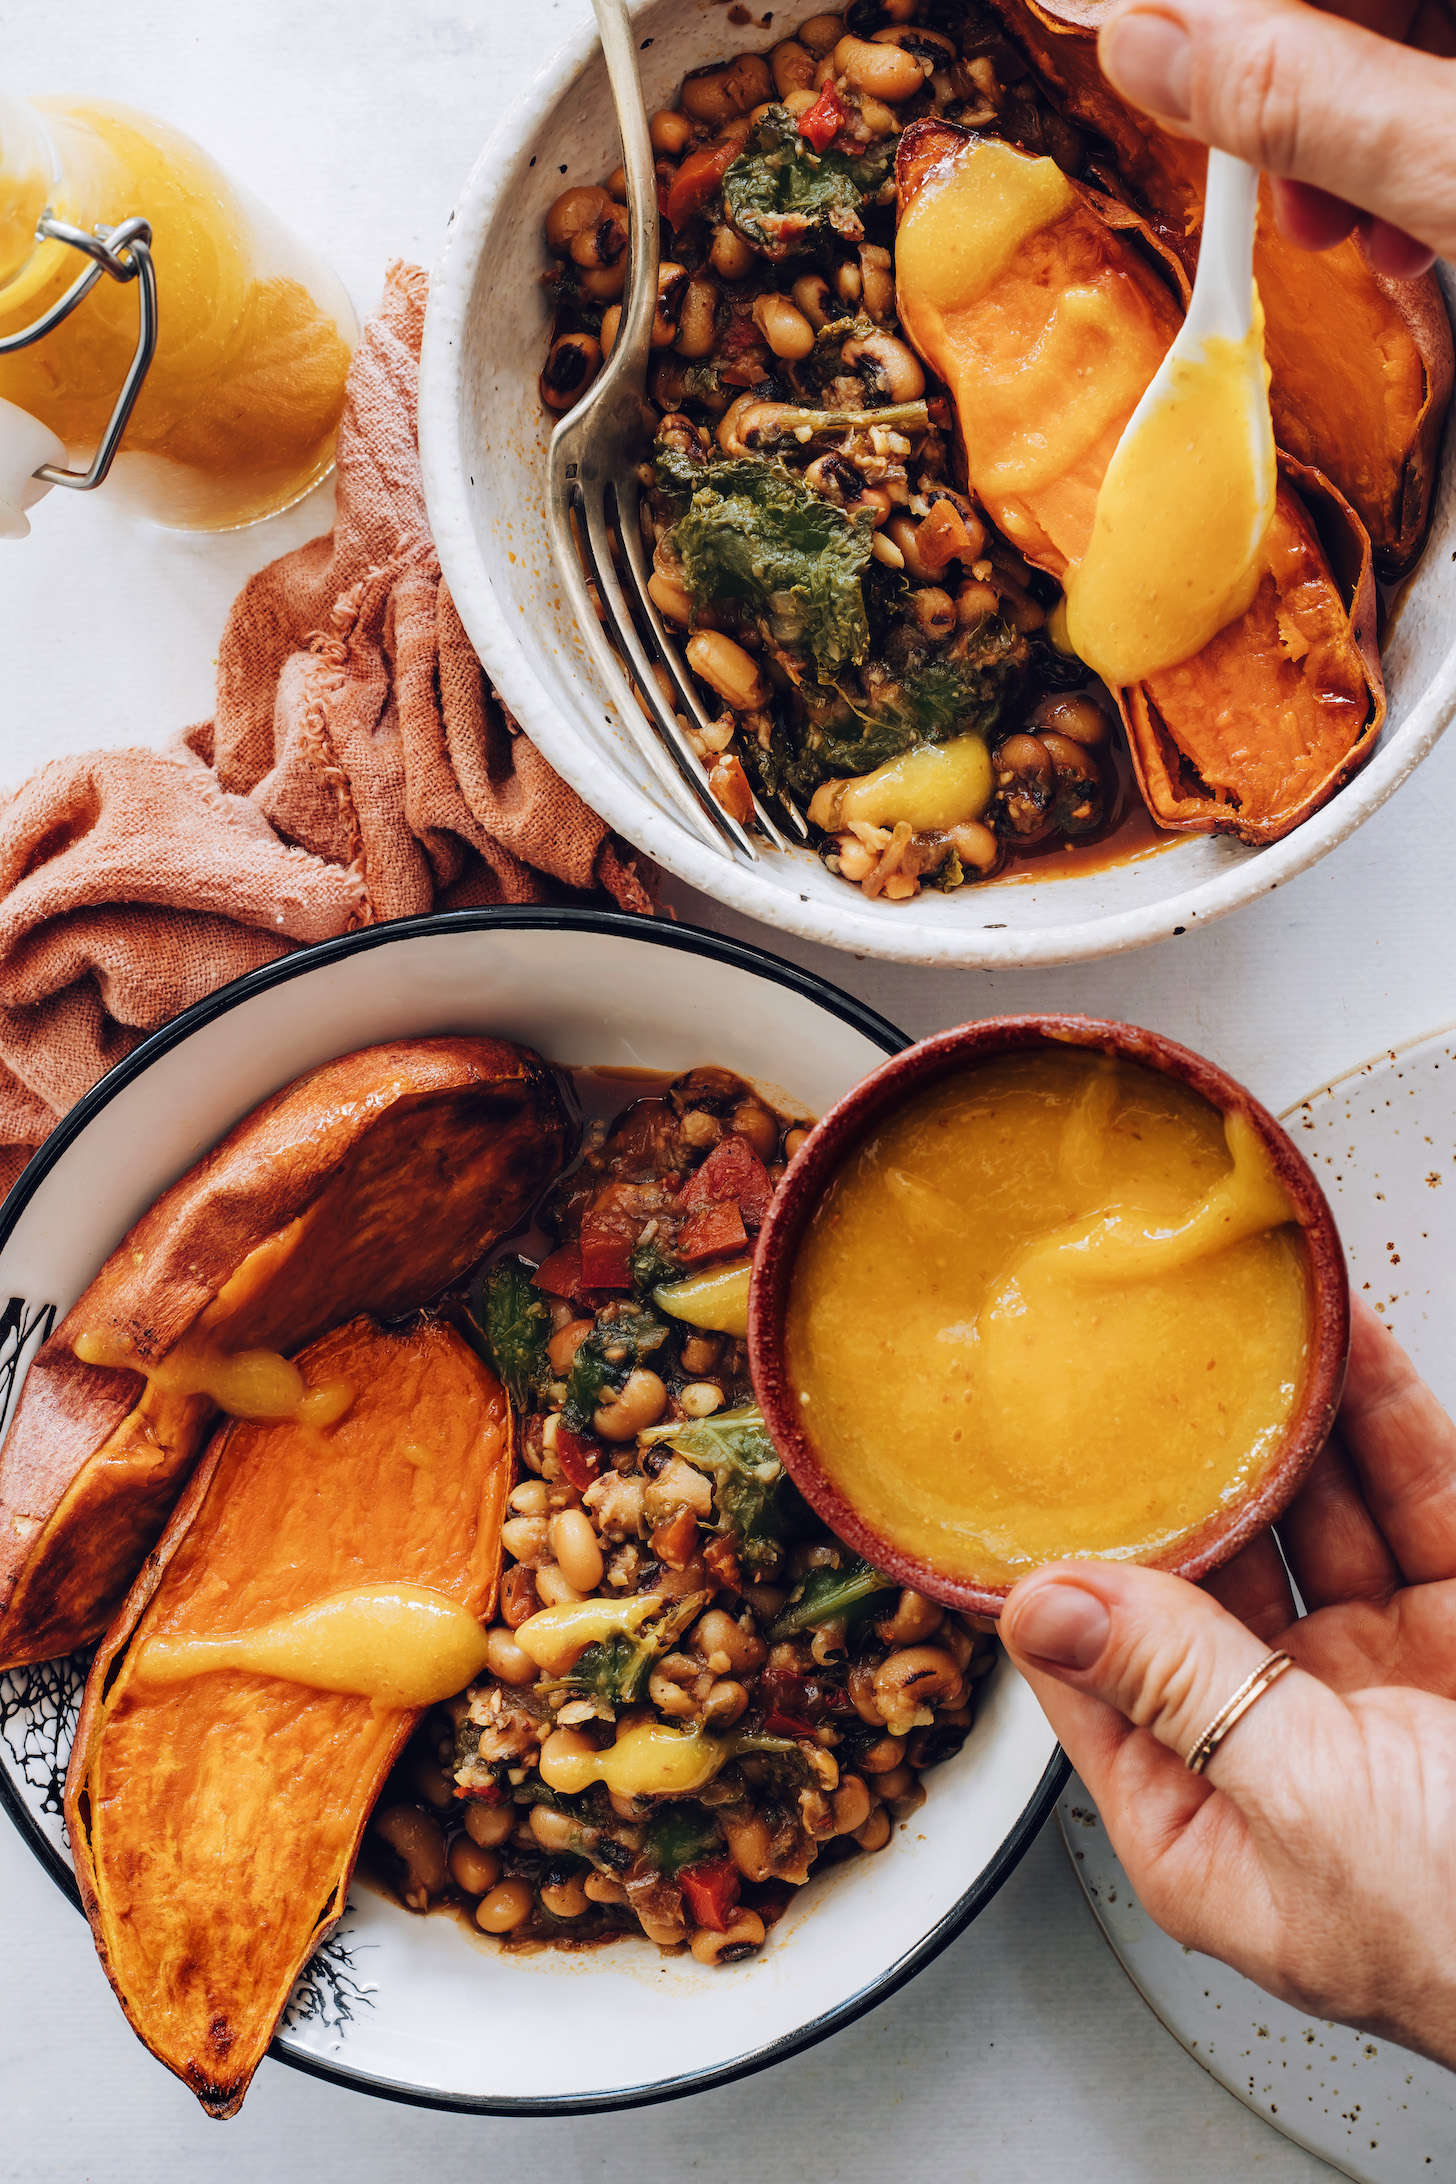 Adding hot sauce to sweet potato nourish bowls